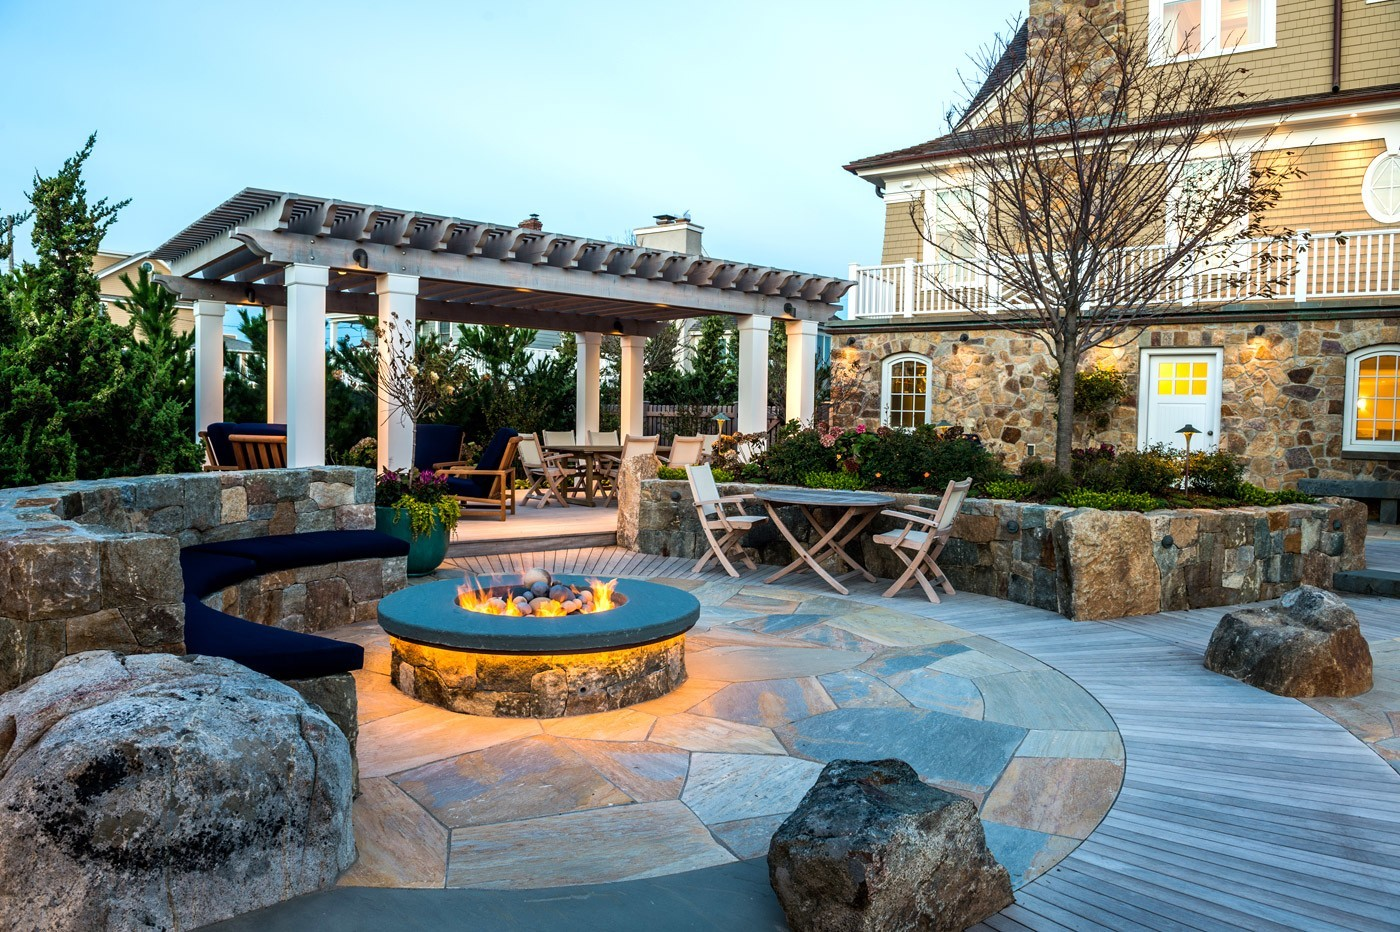 Cording Landscape Design New Jersey Landscaping Pool Estate Spa 4 Cording Landscape Design